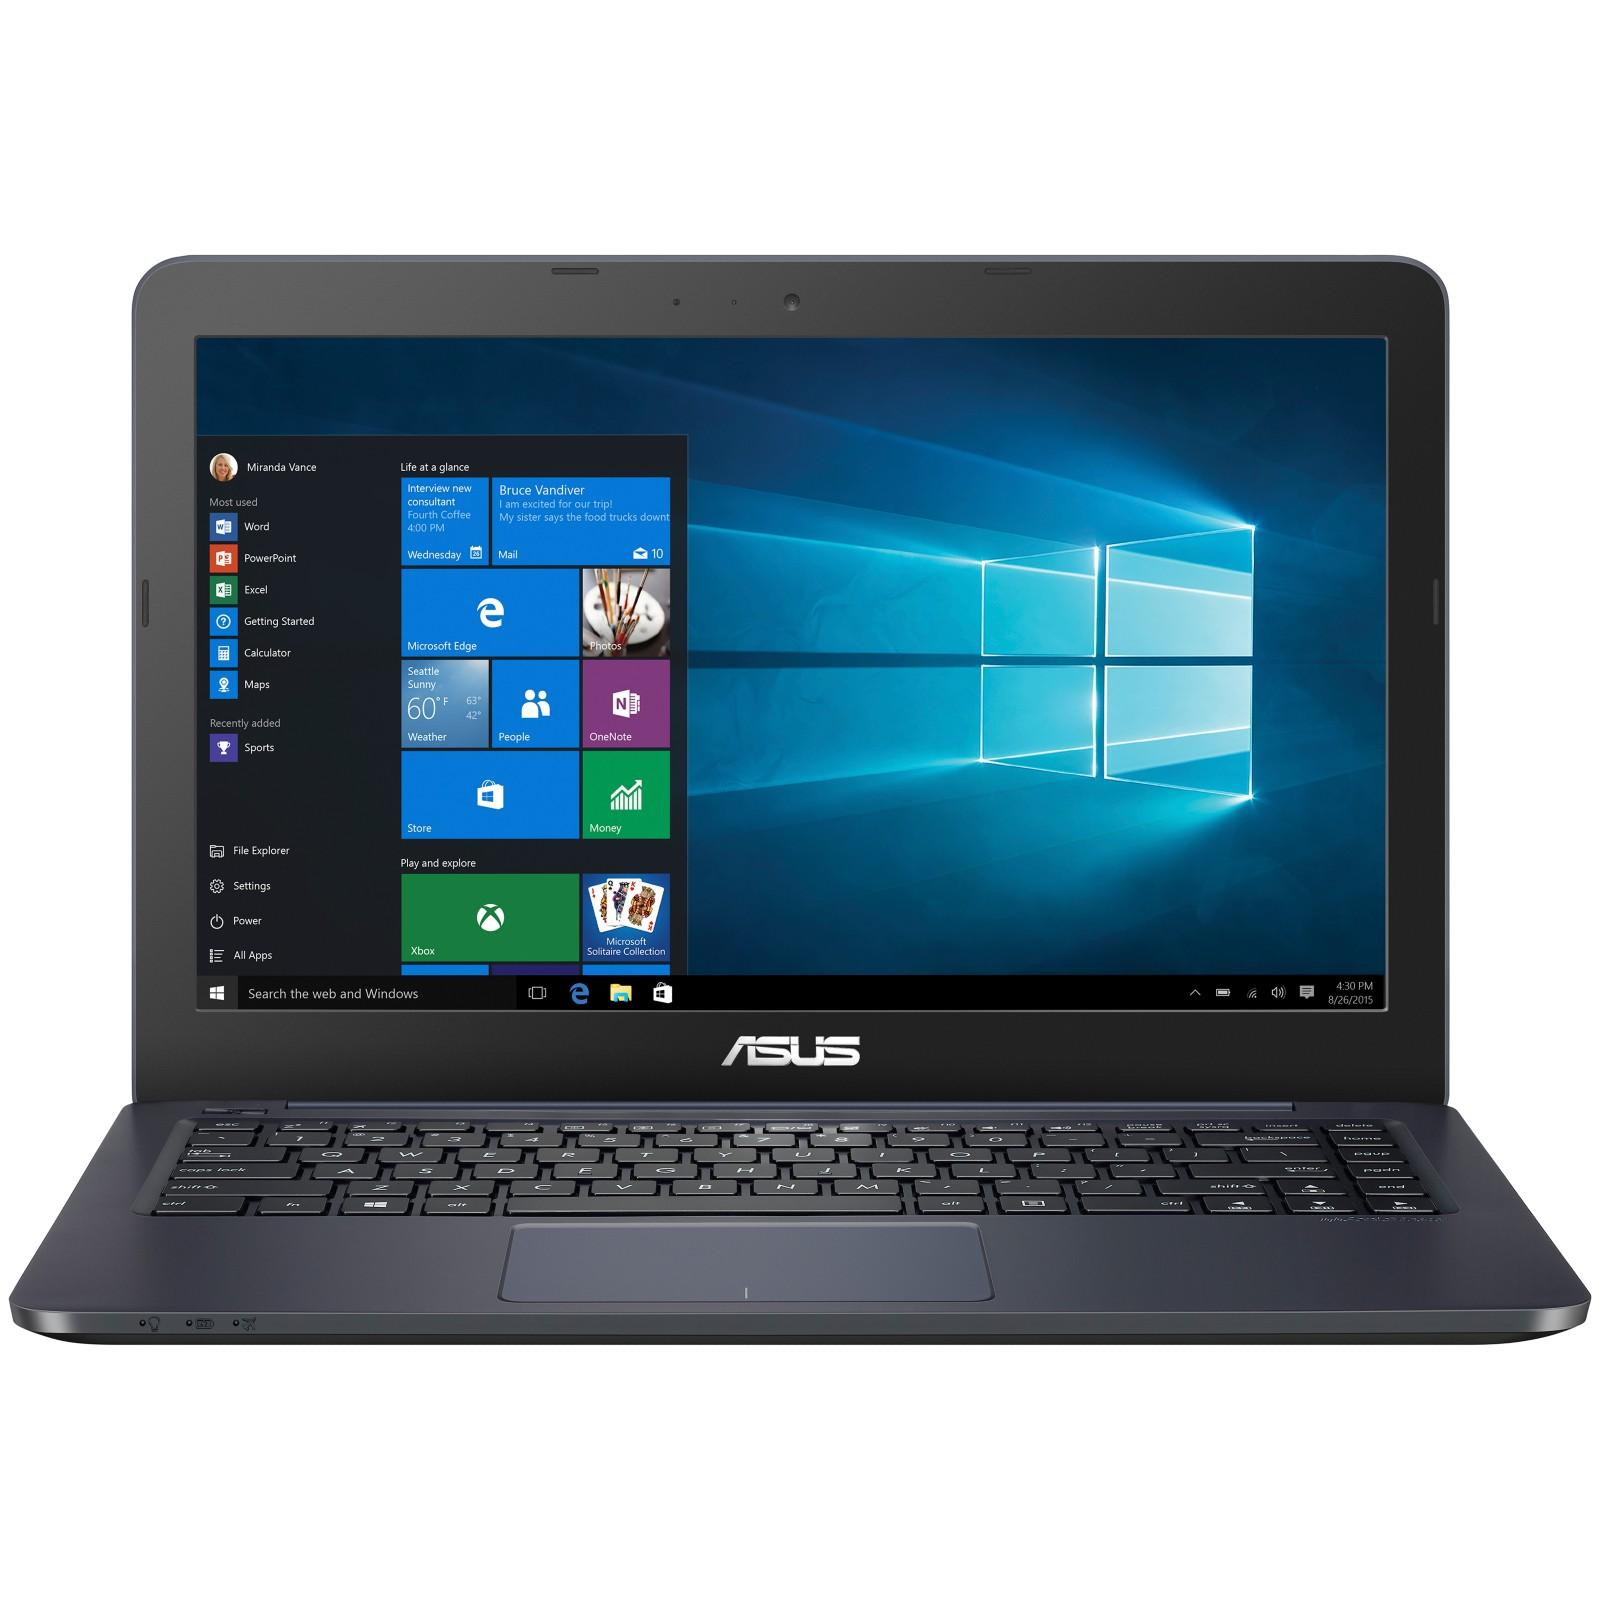 ASUS EeeBook E402 Laptop